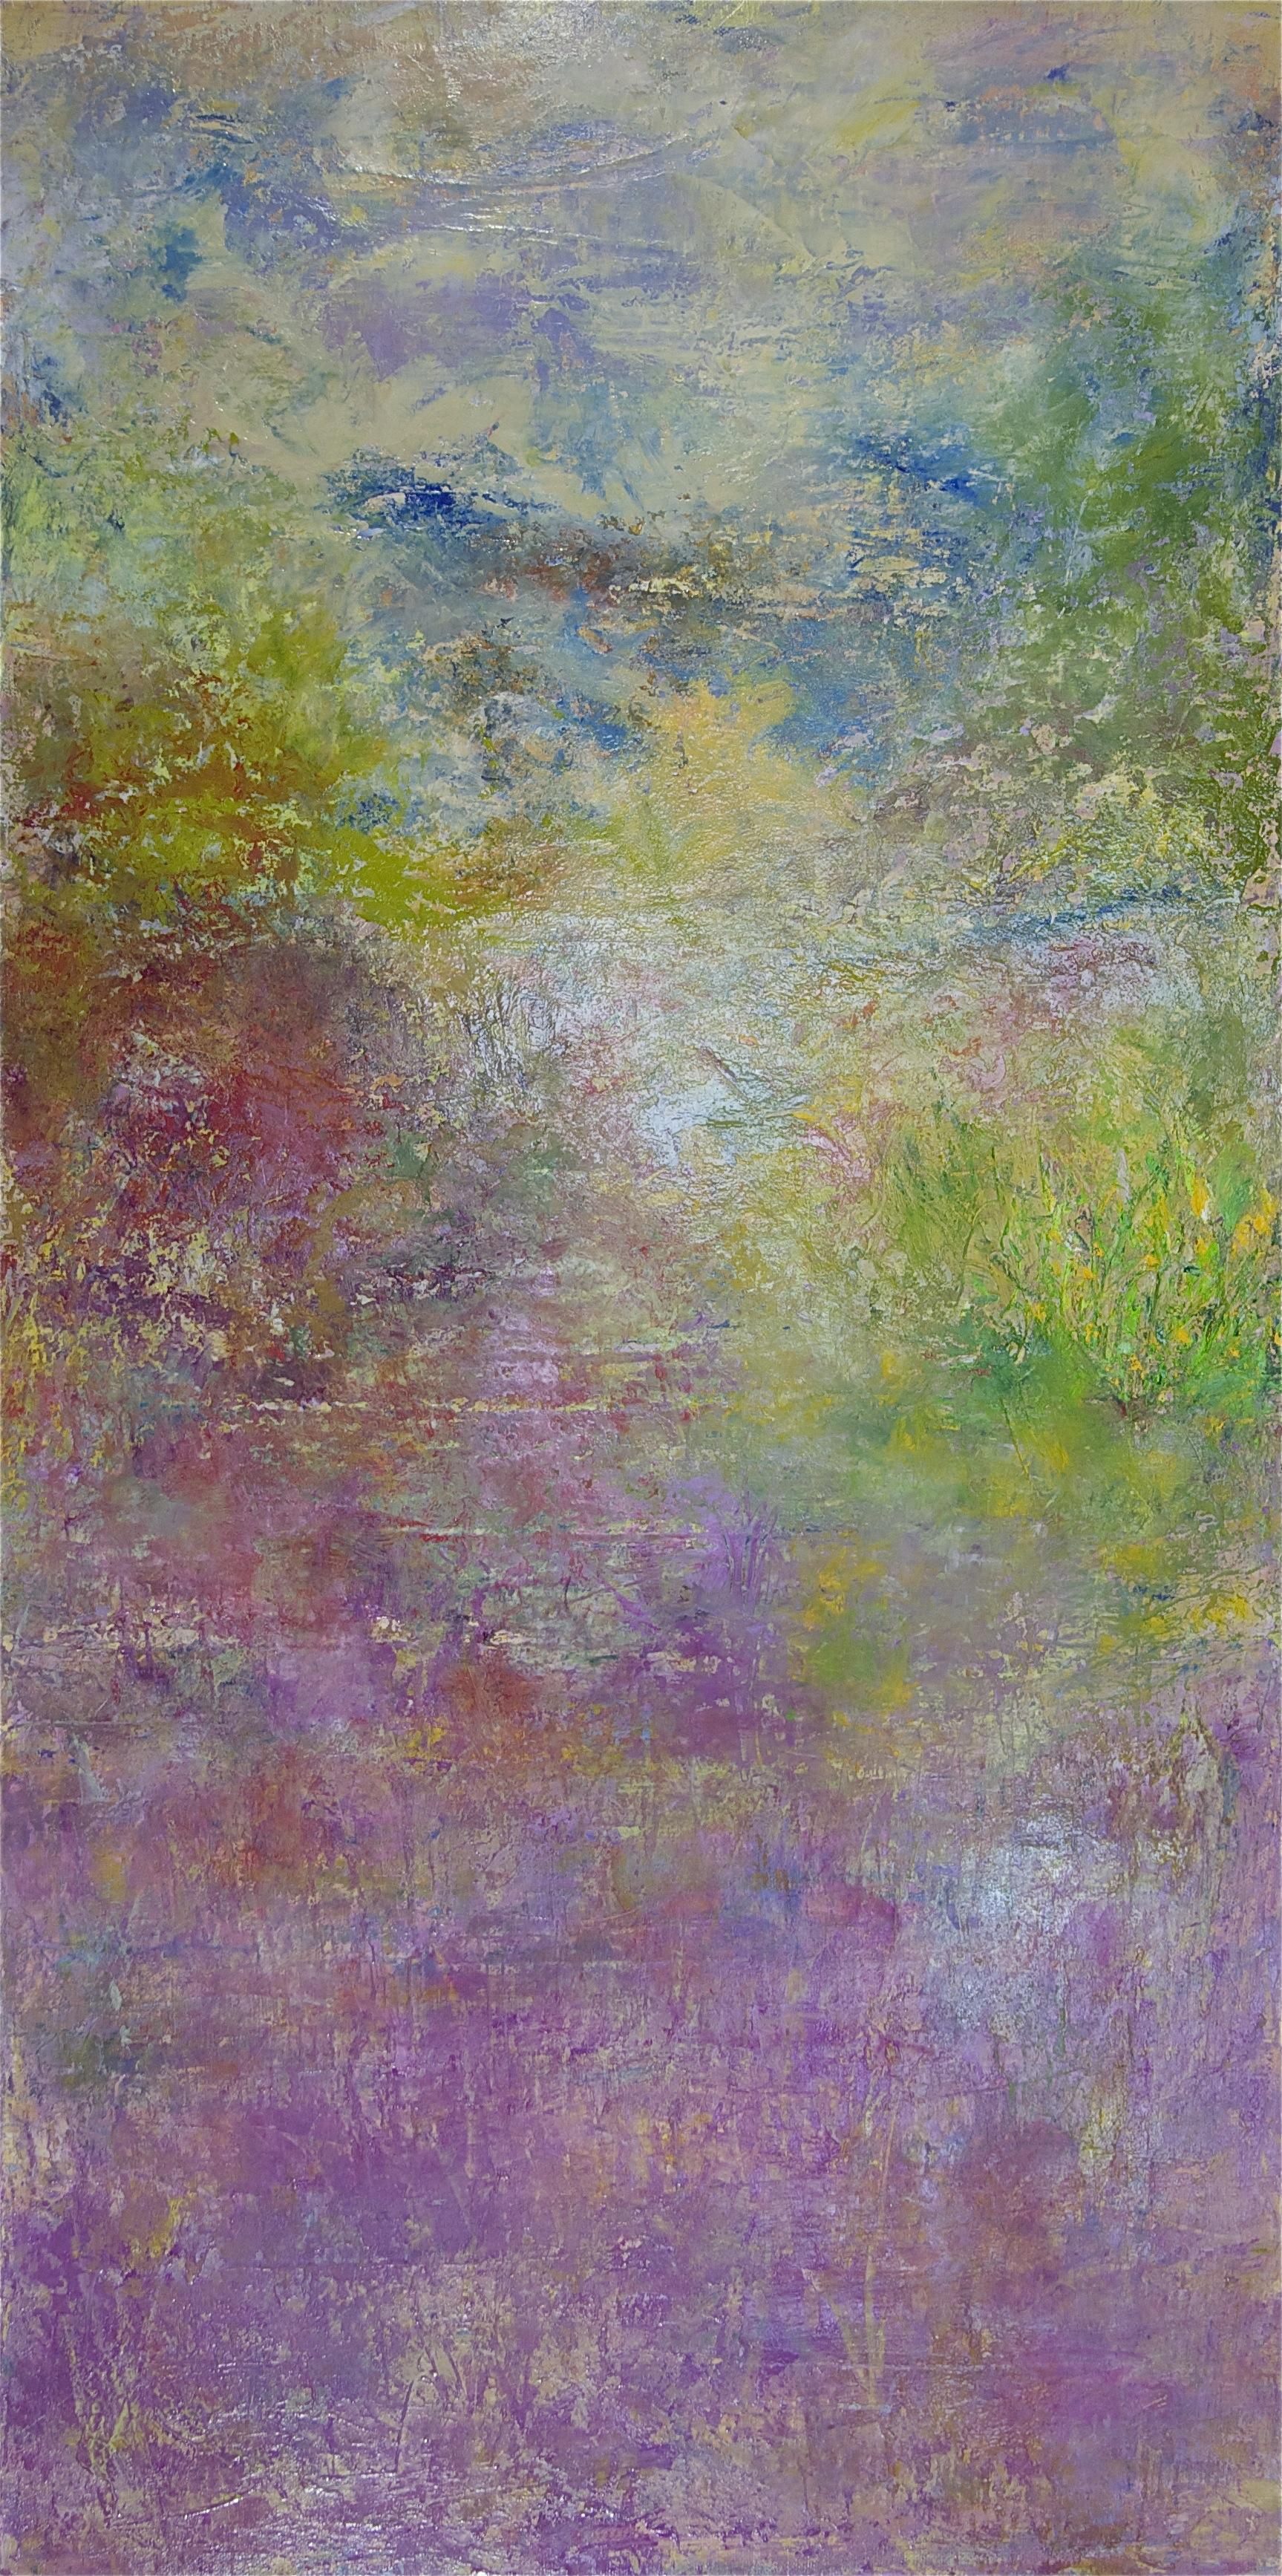 Jill S. Krutick, PINK FIELD,Oil on canvas, 36 x 18 inches (91.4 x 45.7 cm).